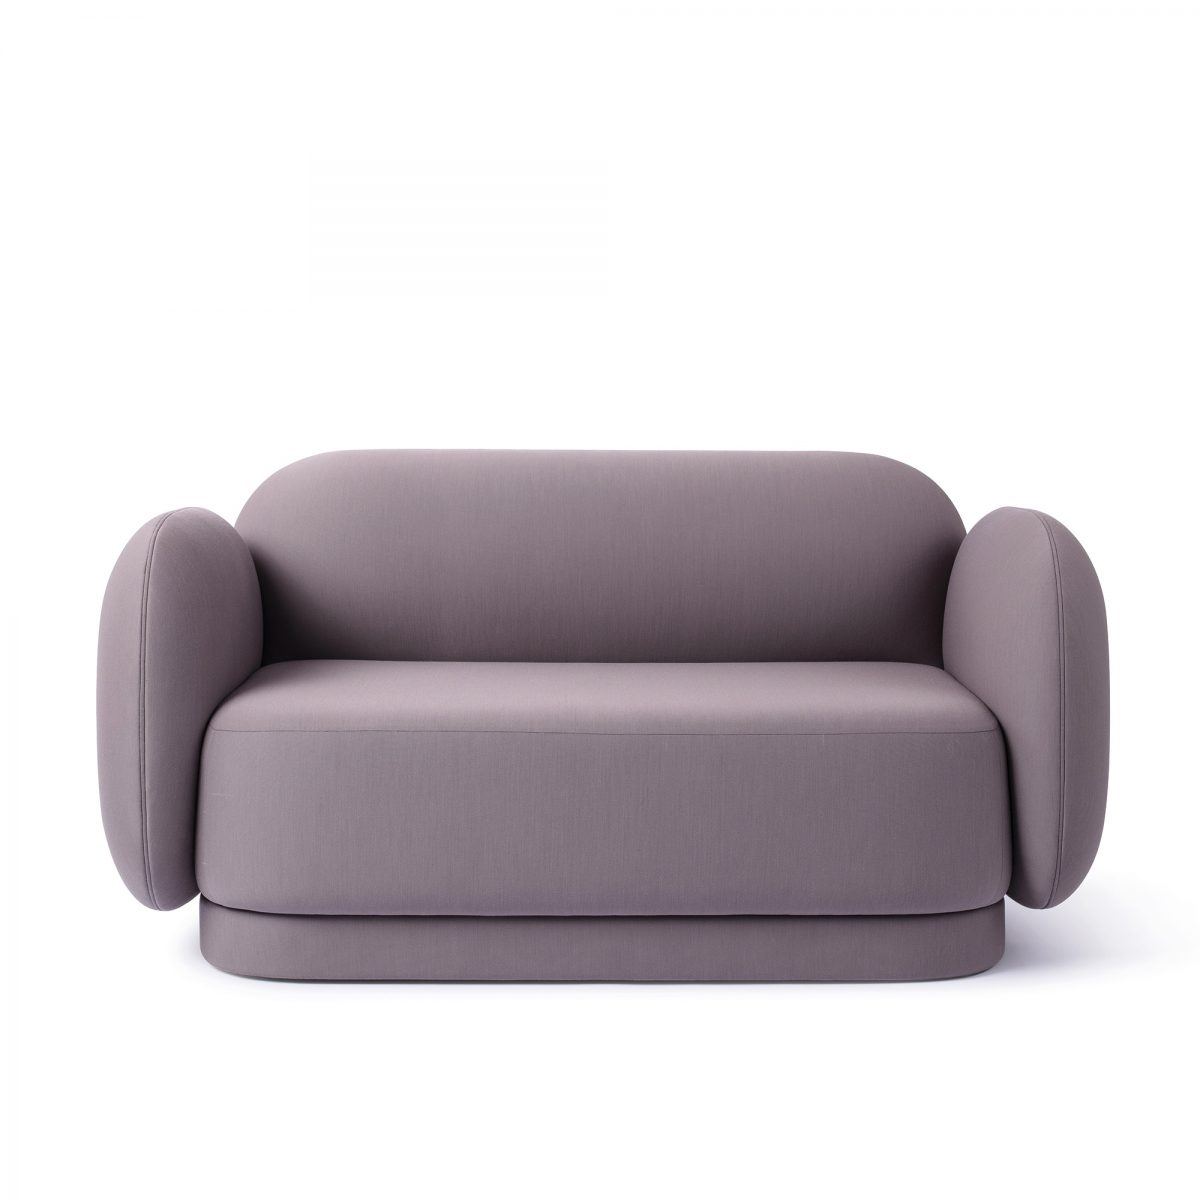 1-major-tom-two-seats-seaters-sofas-grey-maison-dada